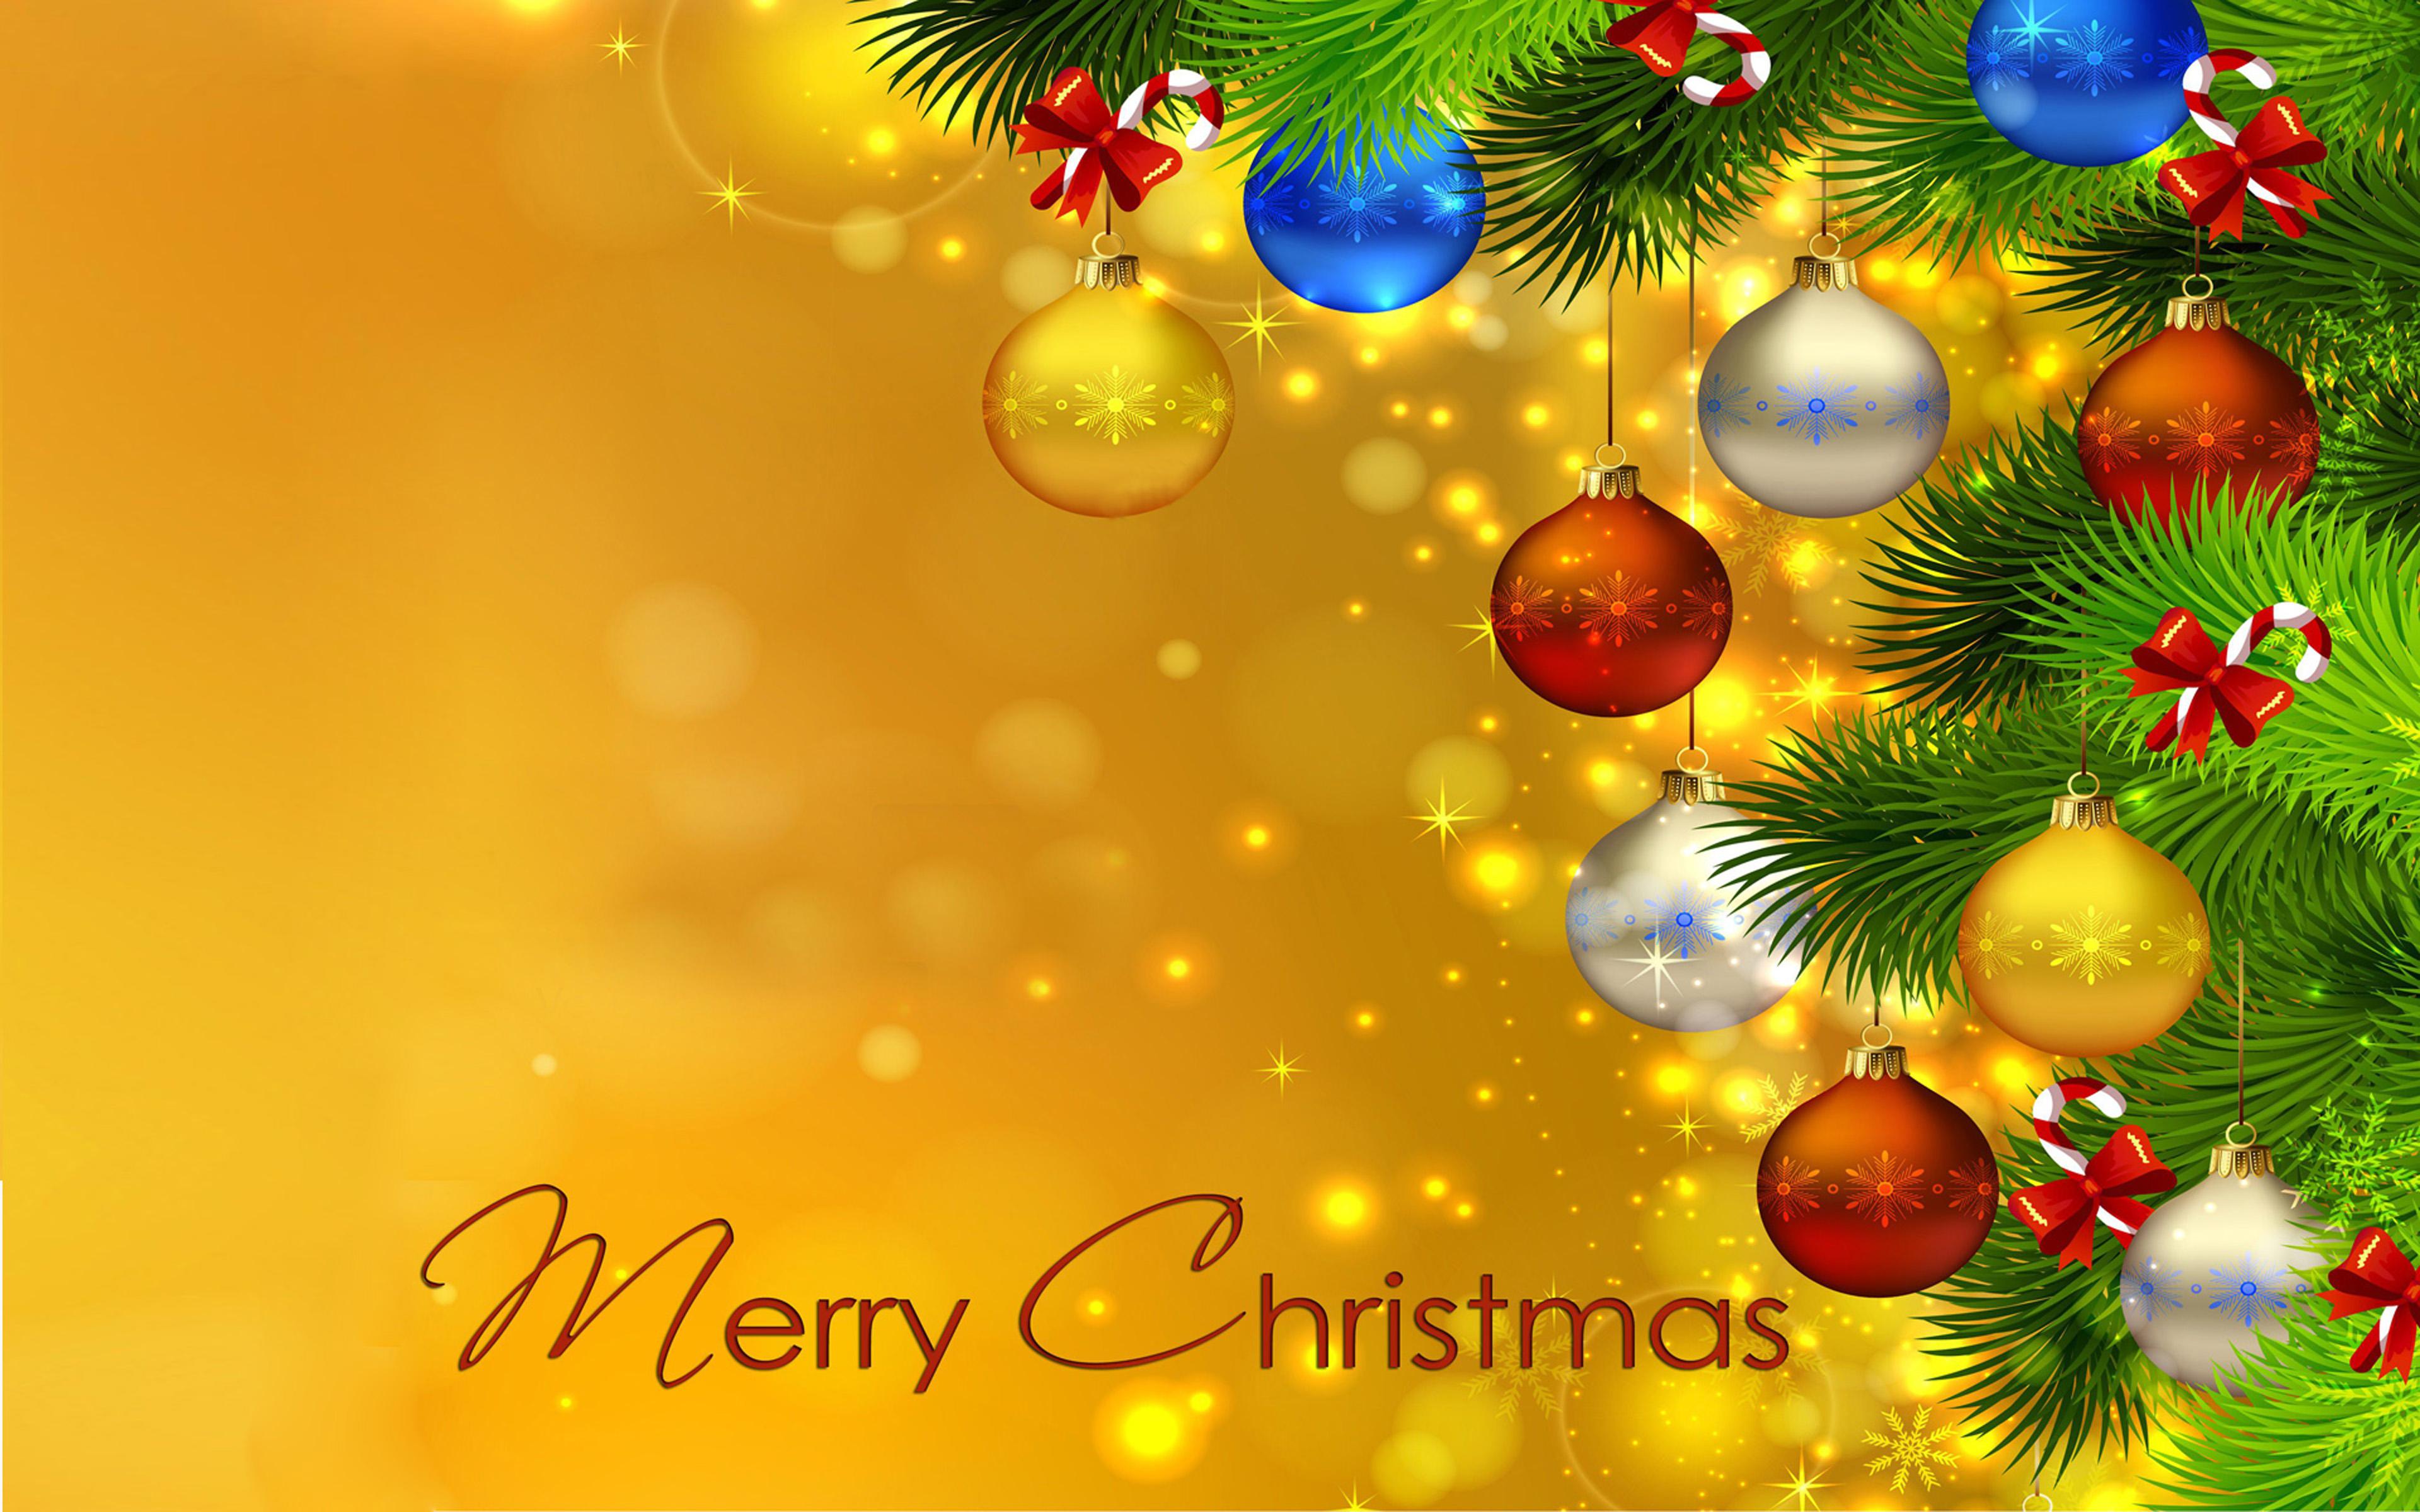 Iphone X Template Wallpaper Merry Christmas Christmas Tree Colorful Christmas Balls